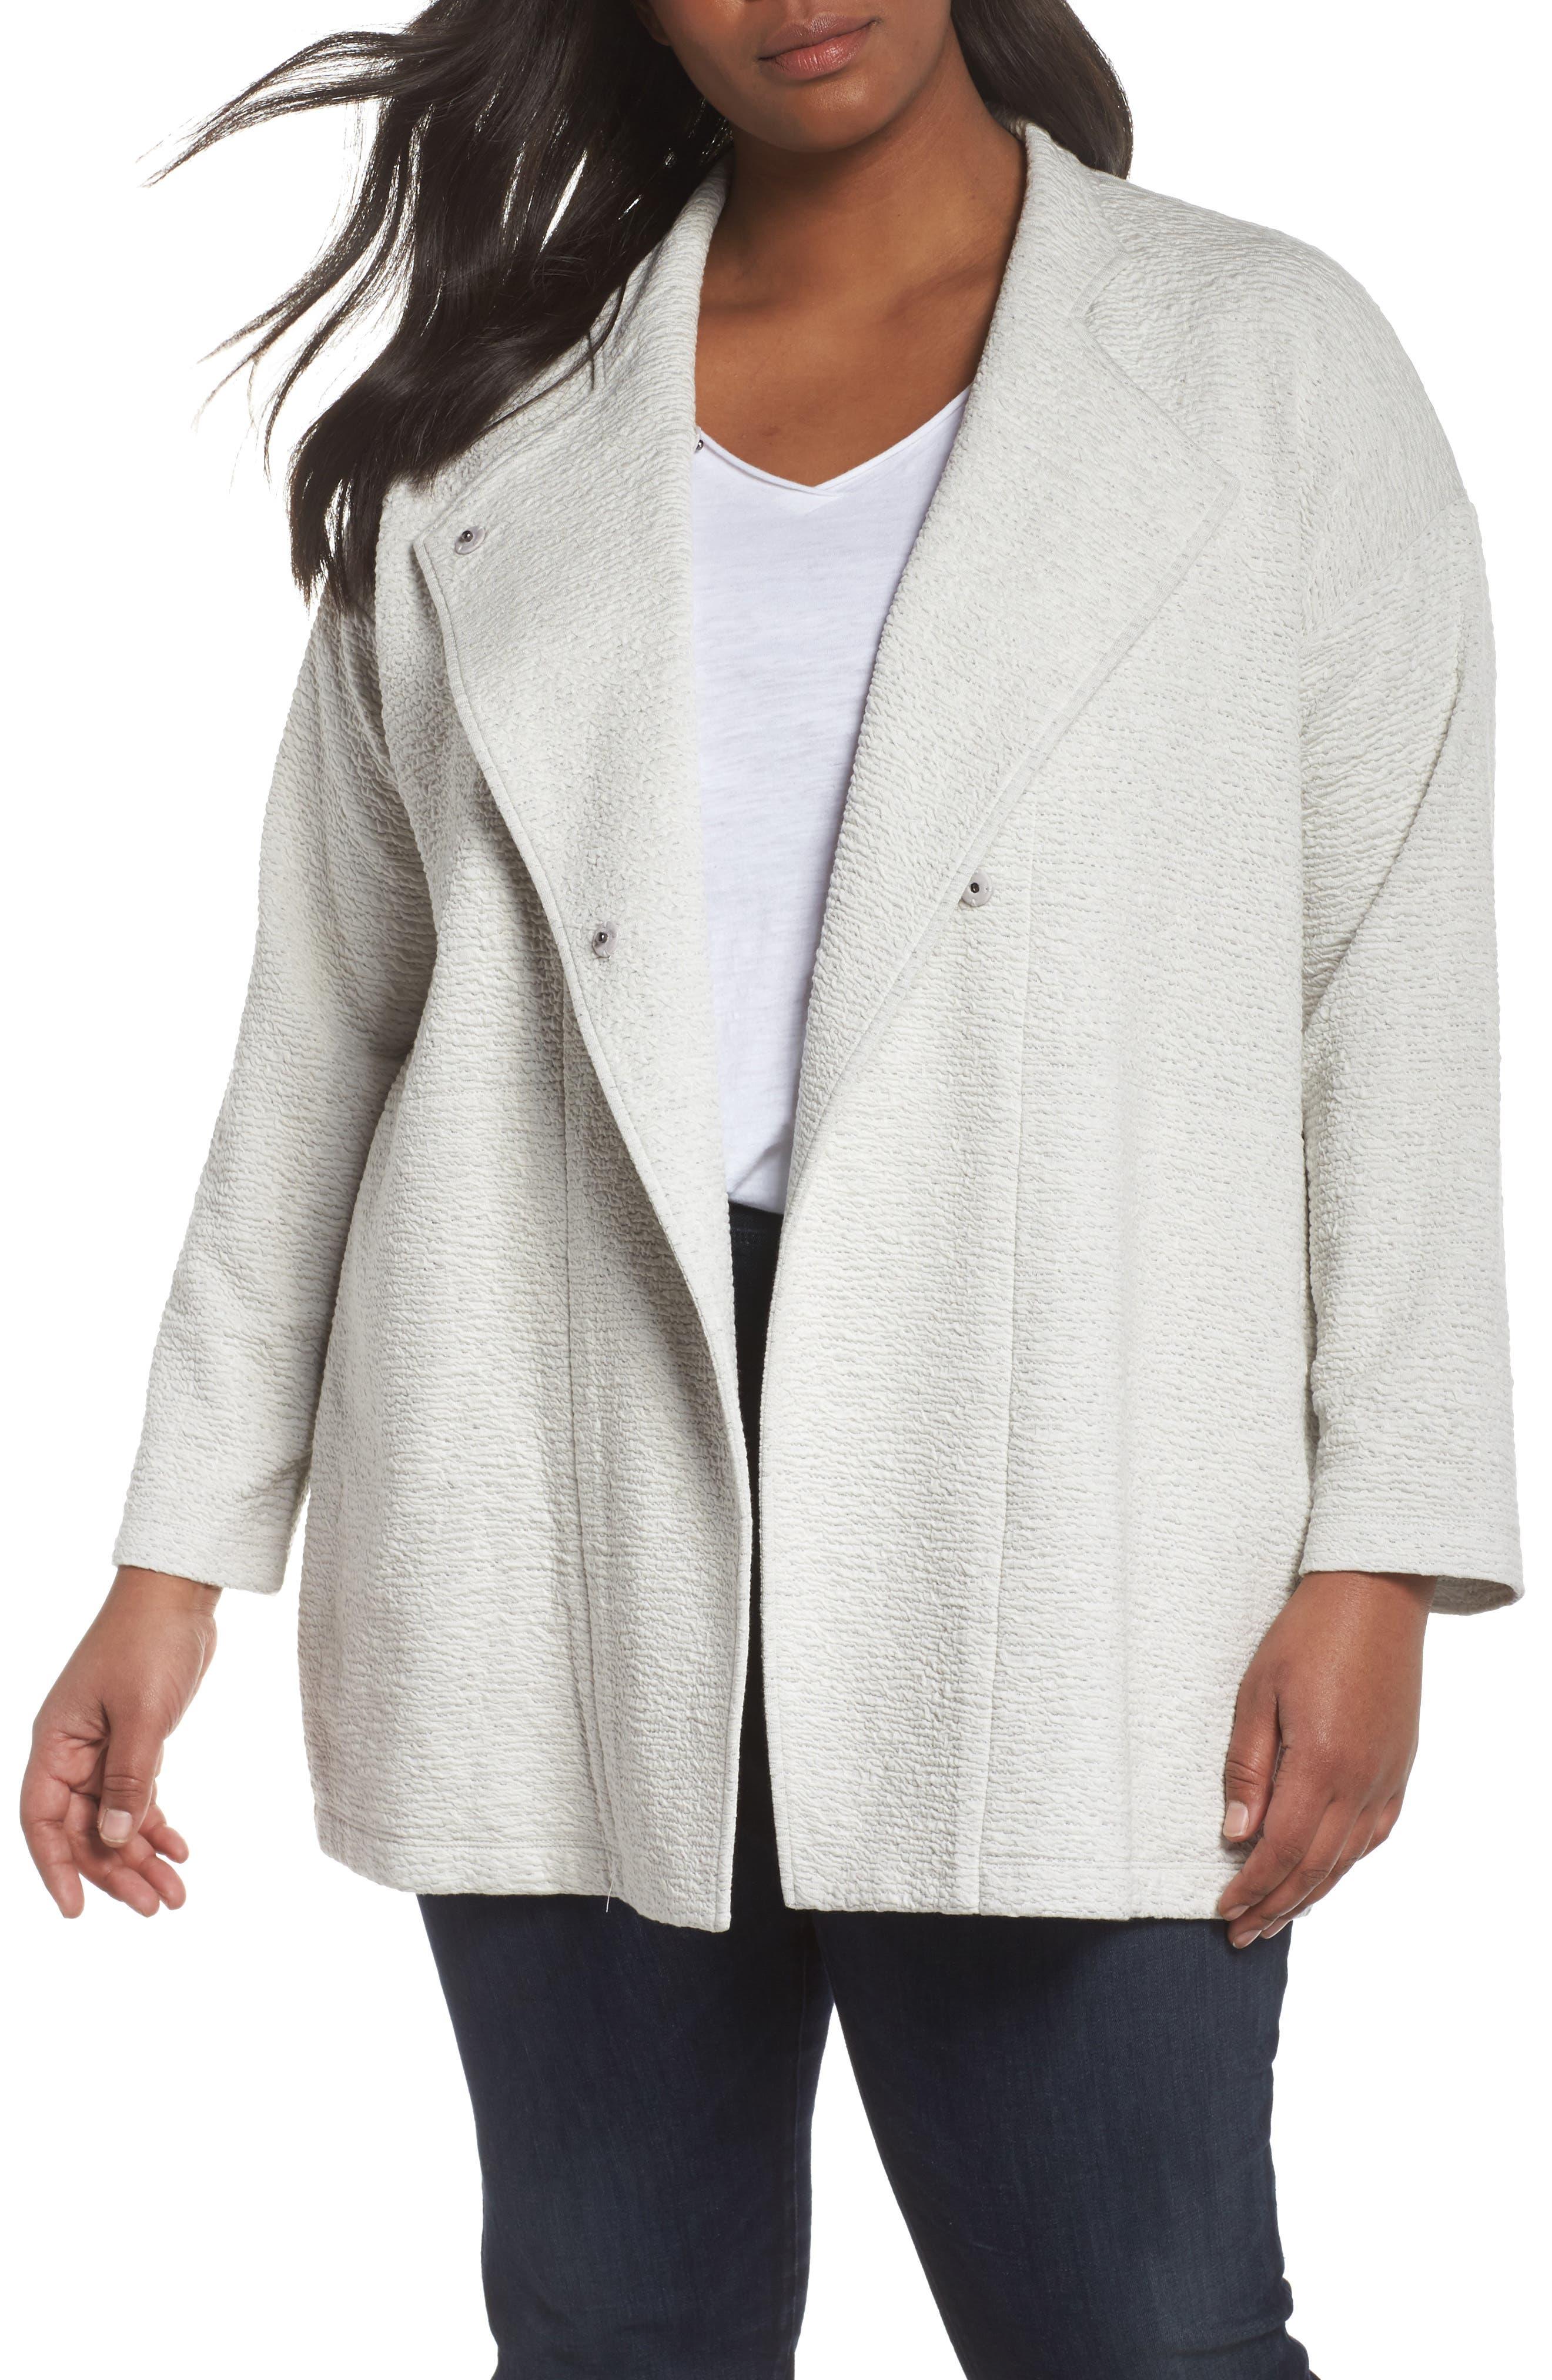 Alternate Image 1 Selected - Eileen Fisher Textured Tencel® Lyocell Kimono Jacket (Plus Size)